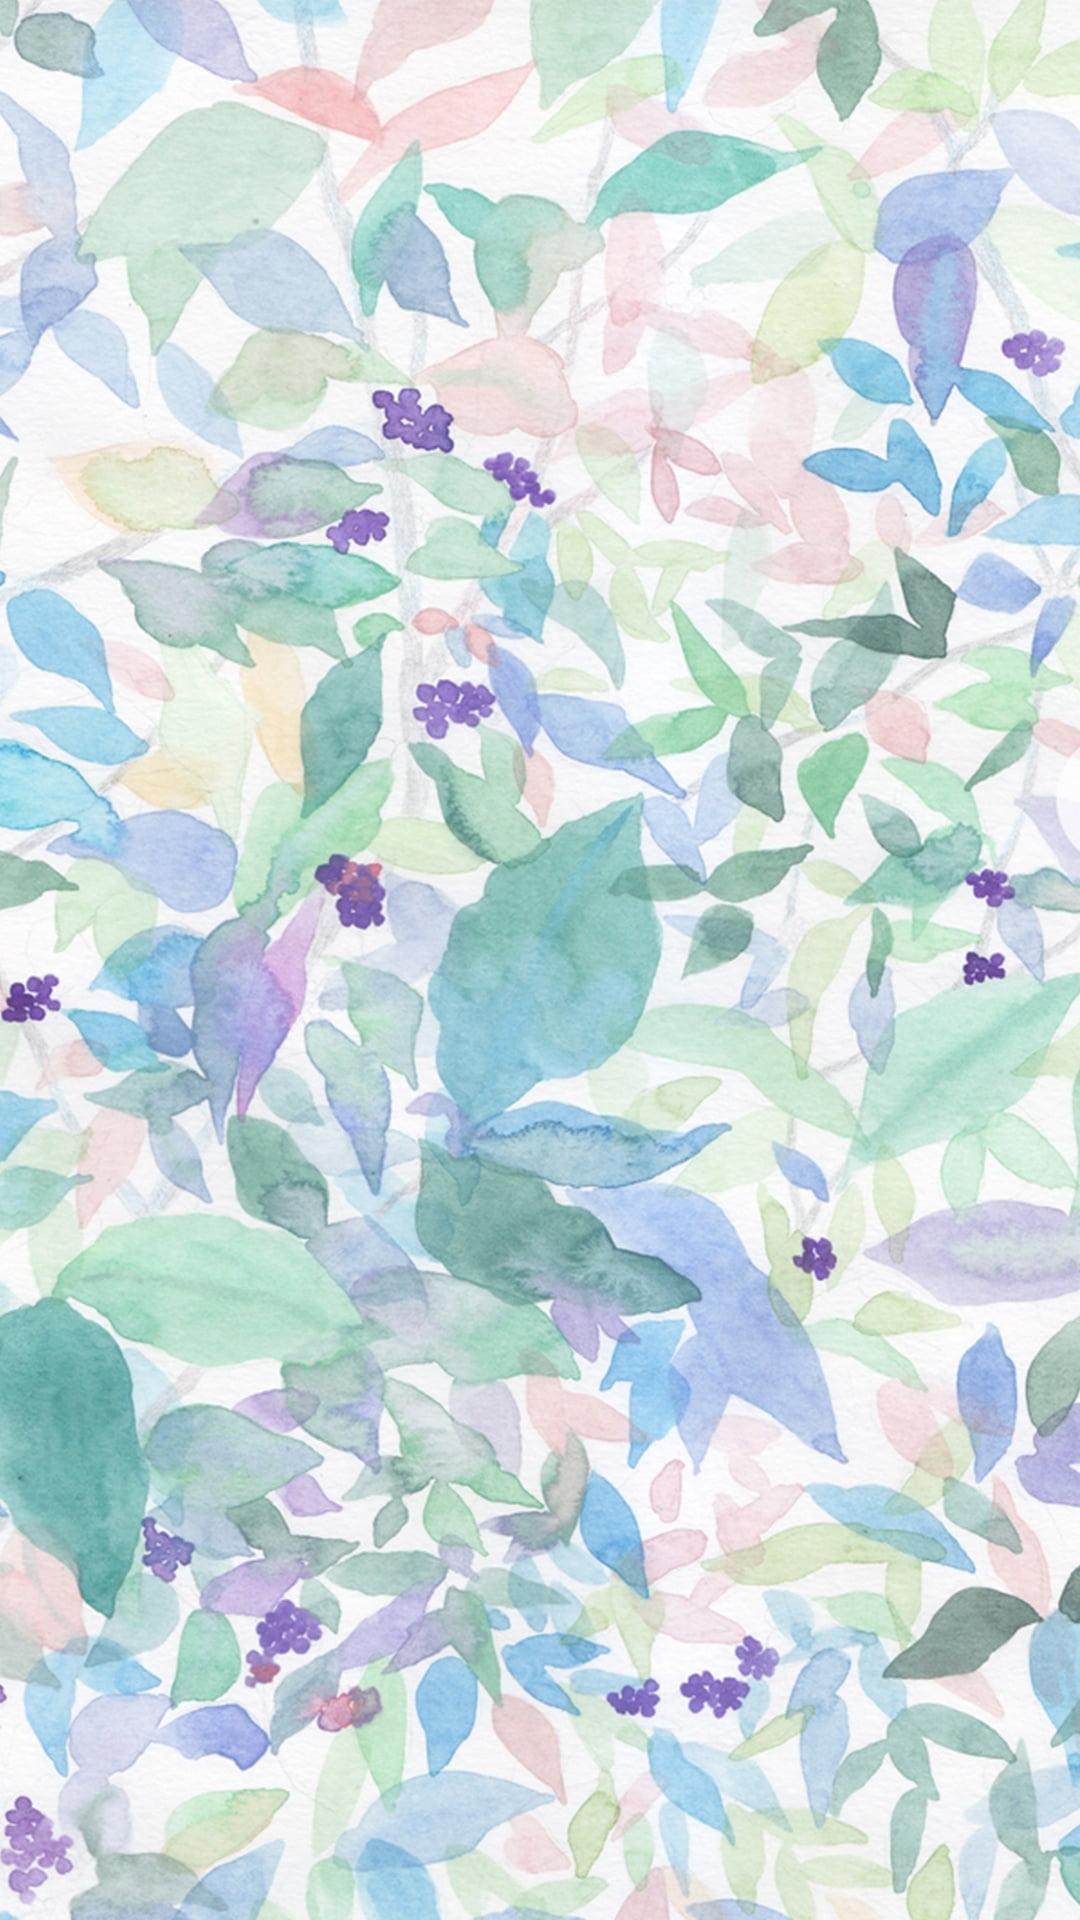 Watercolor Iphone Wallpapers